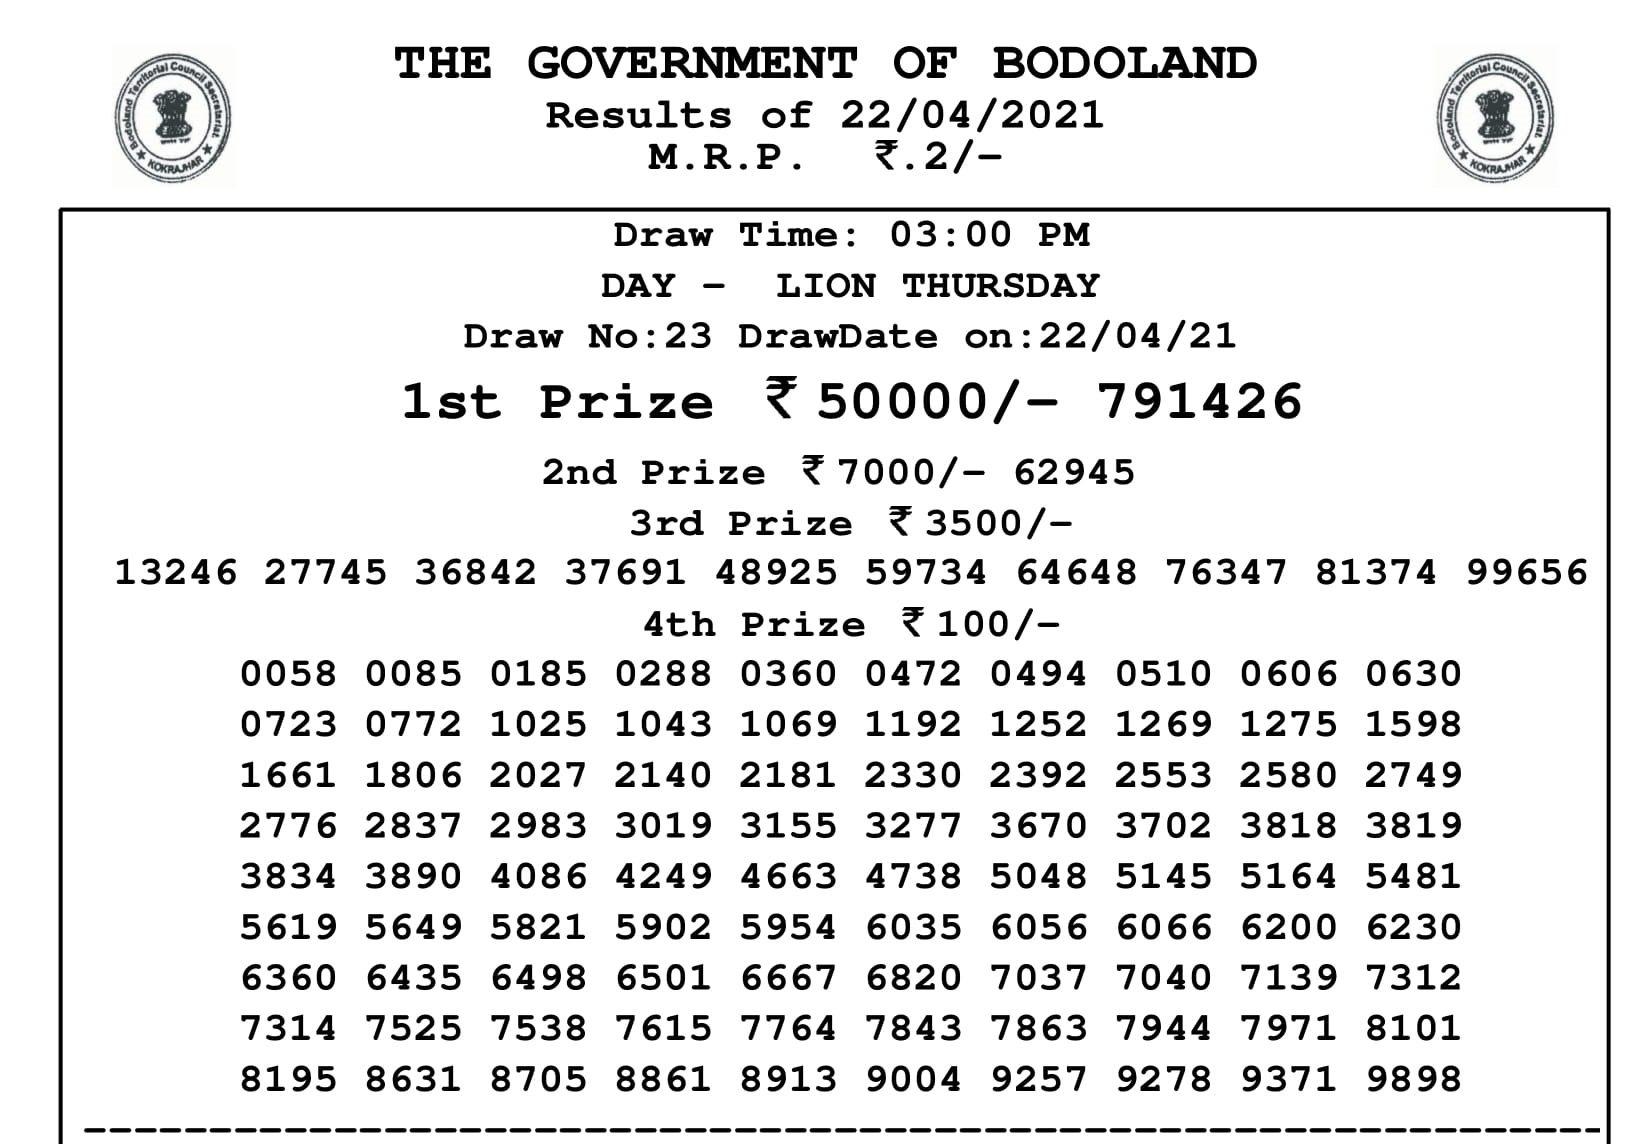 Bodoland lottery Result 22 4 2021